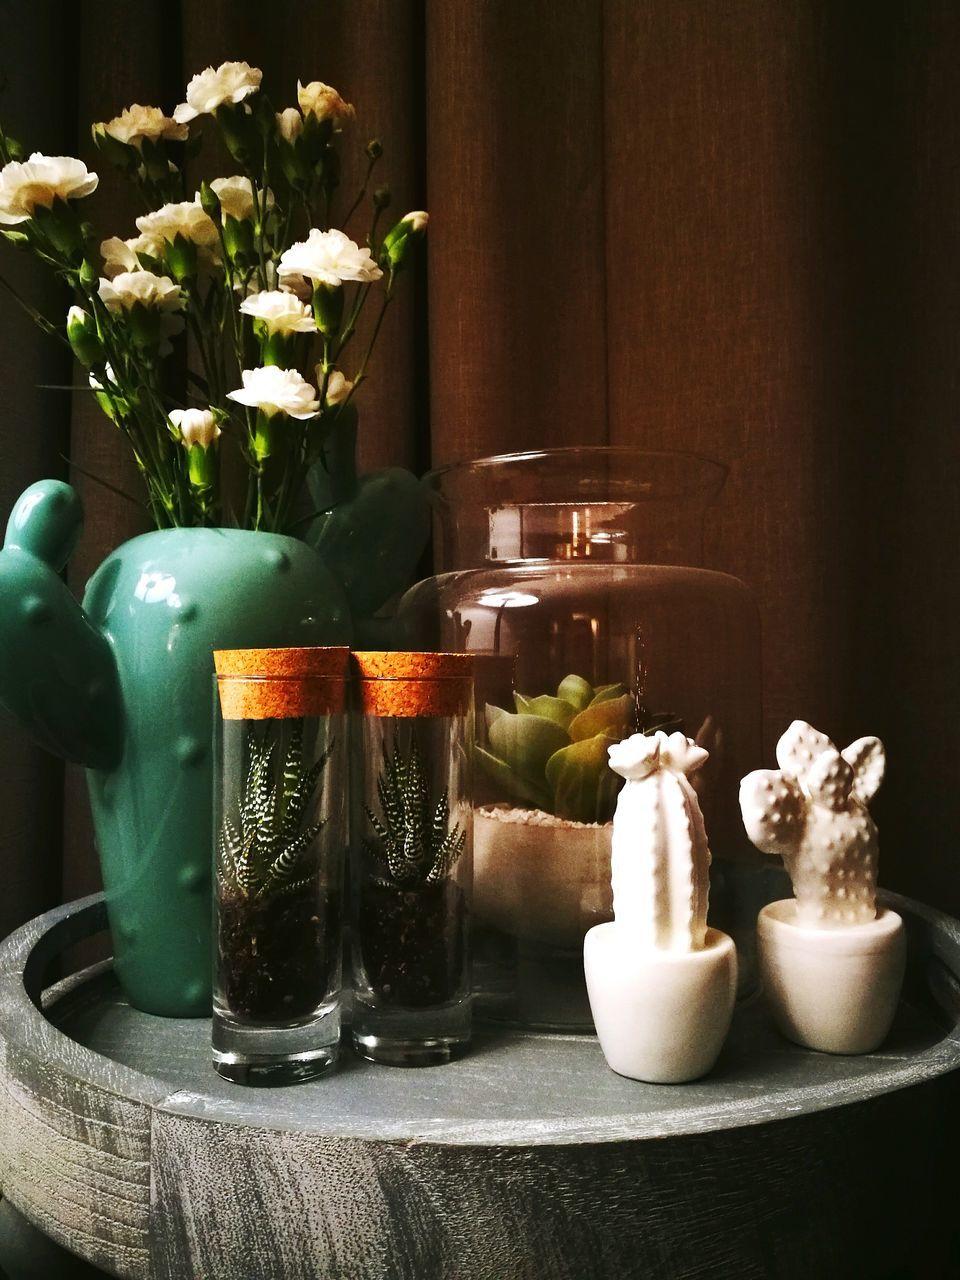 indoors, freshness, flower, table, no people, vase, variation, arrangement, healthy eating, close-up, nature, day